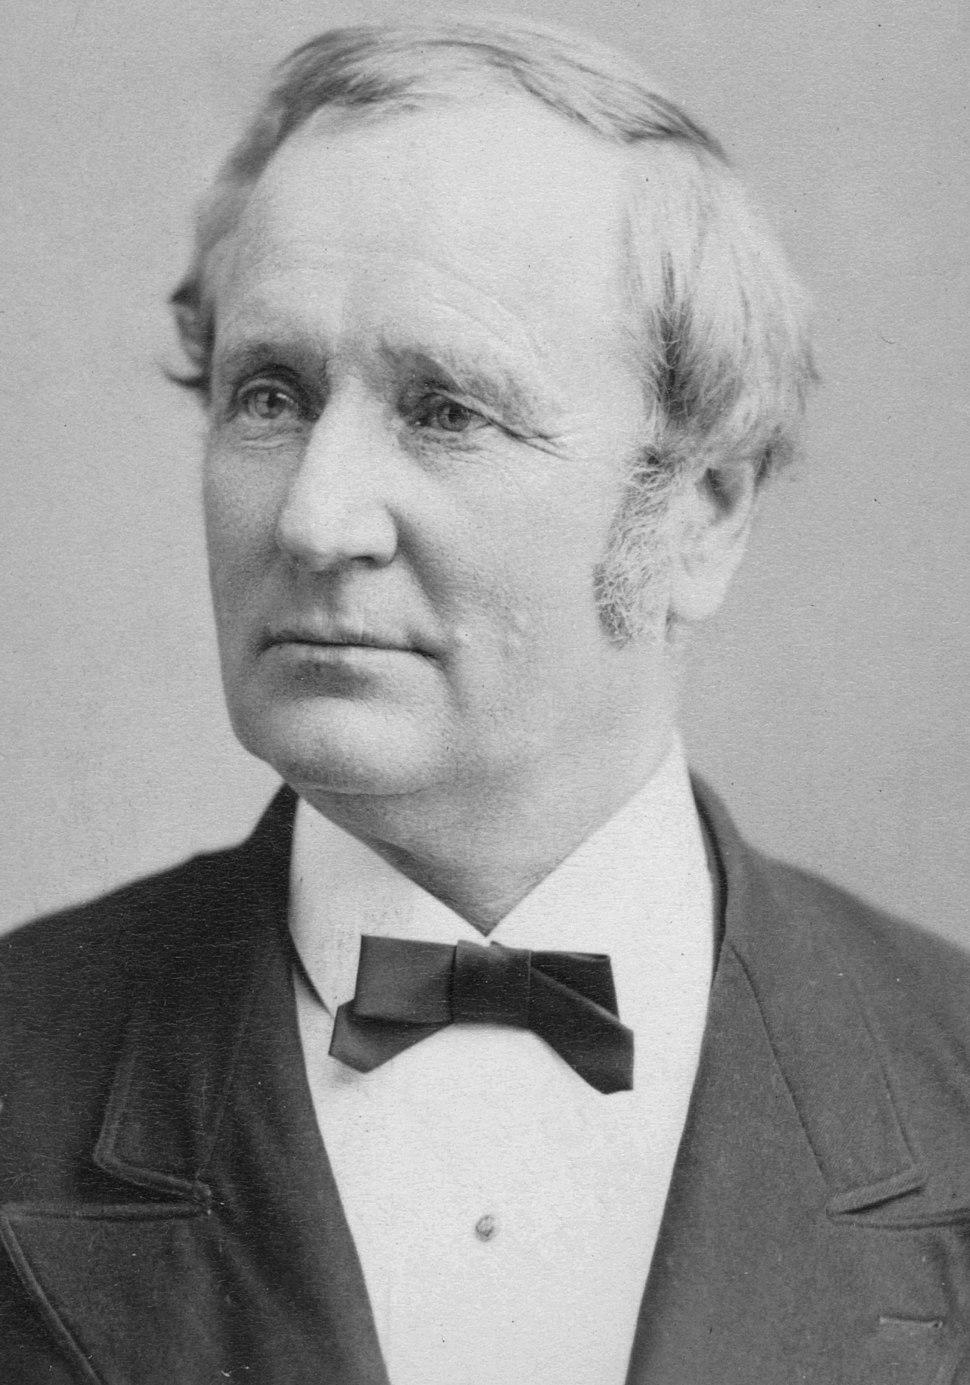 Thomas Andrews Hendricks